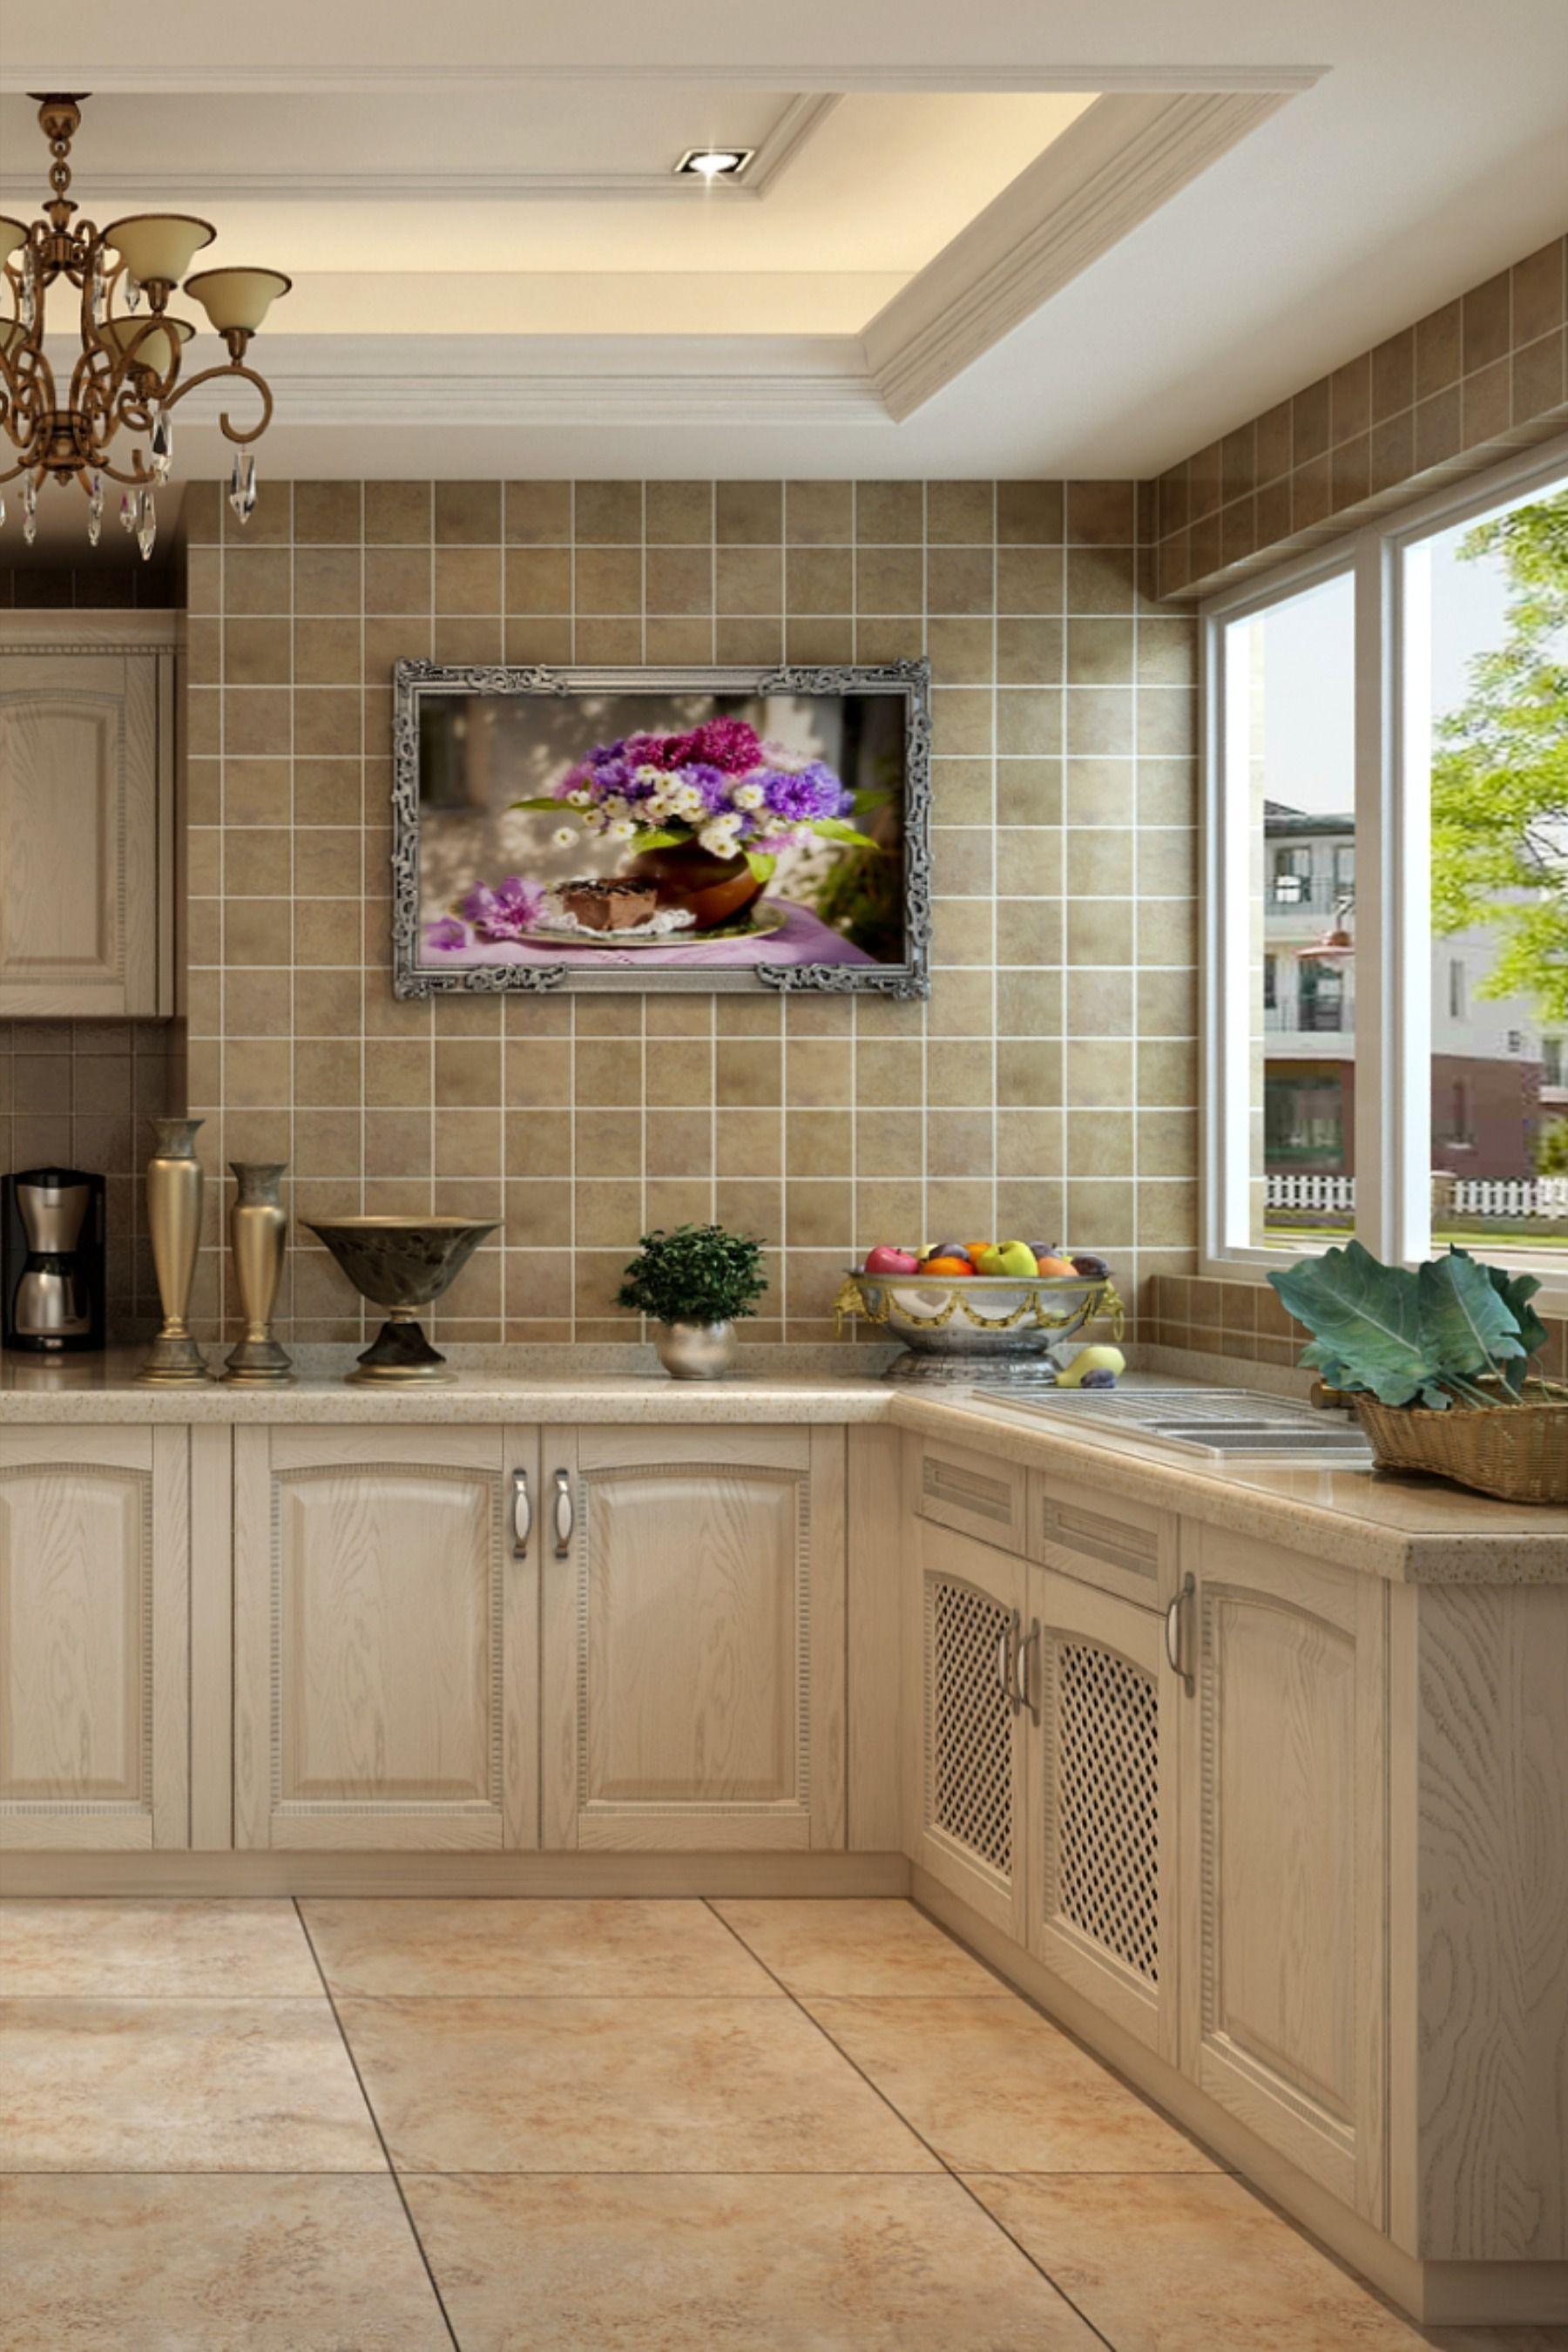 Pvc Blister Kitchen Cabinet Kitchen Cabinets Kitchen Wooden Kitchen Cabinets